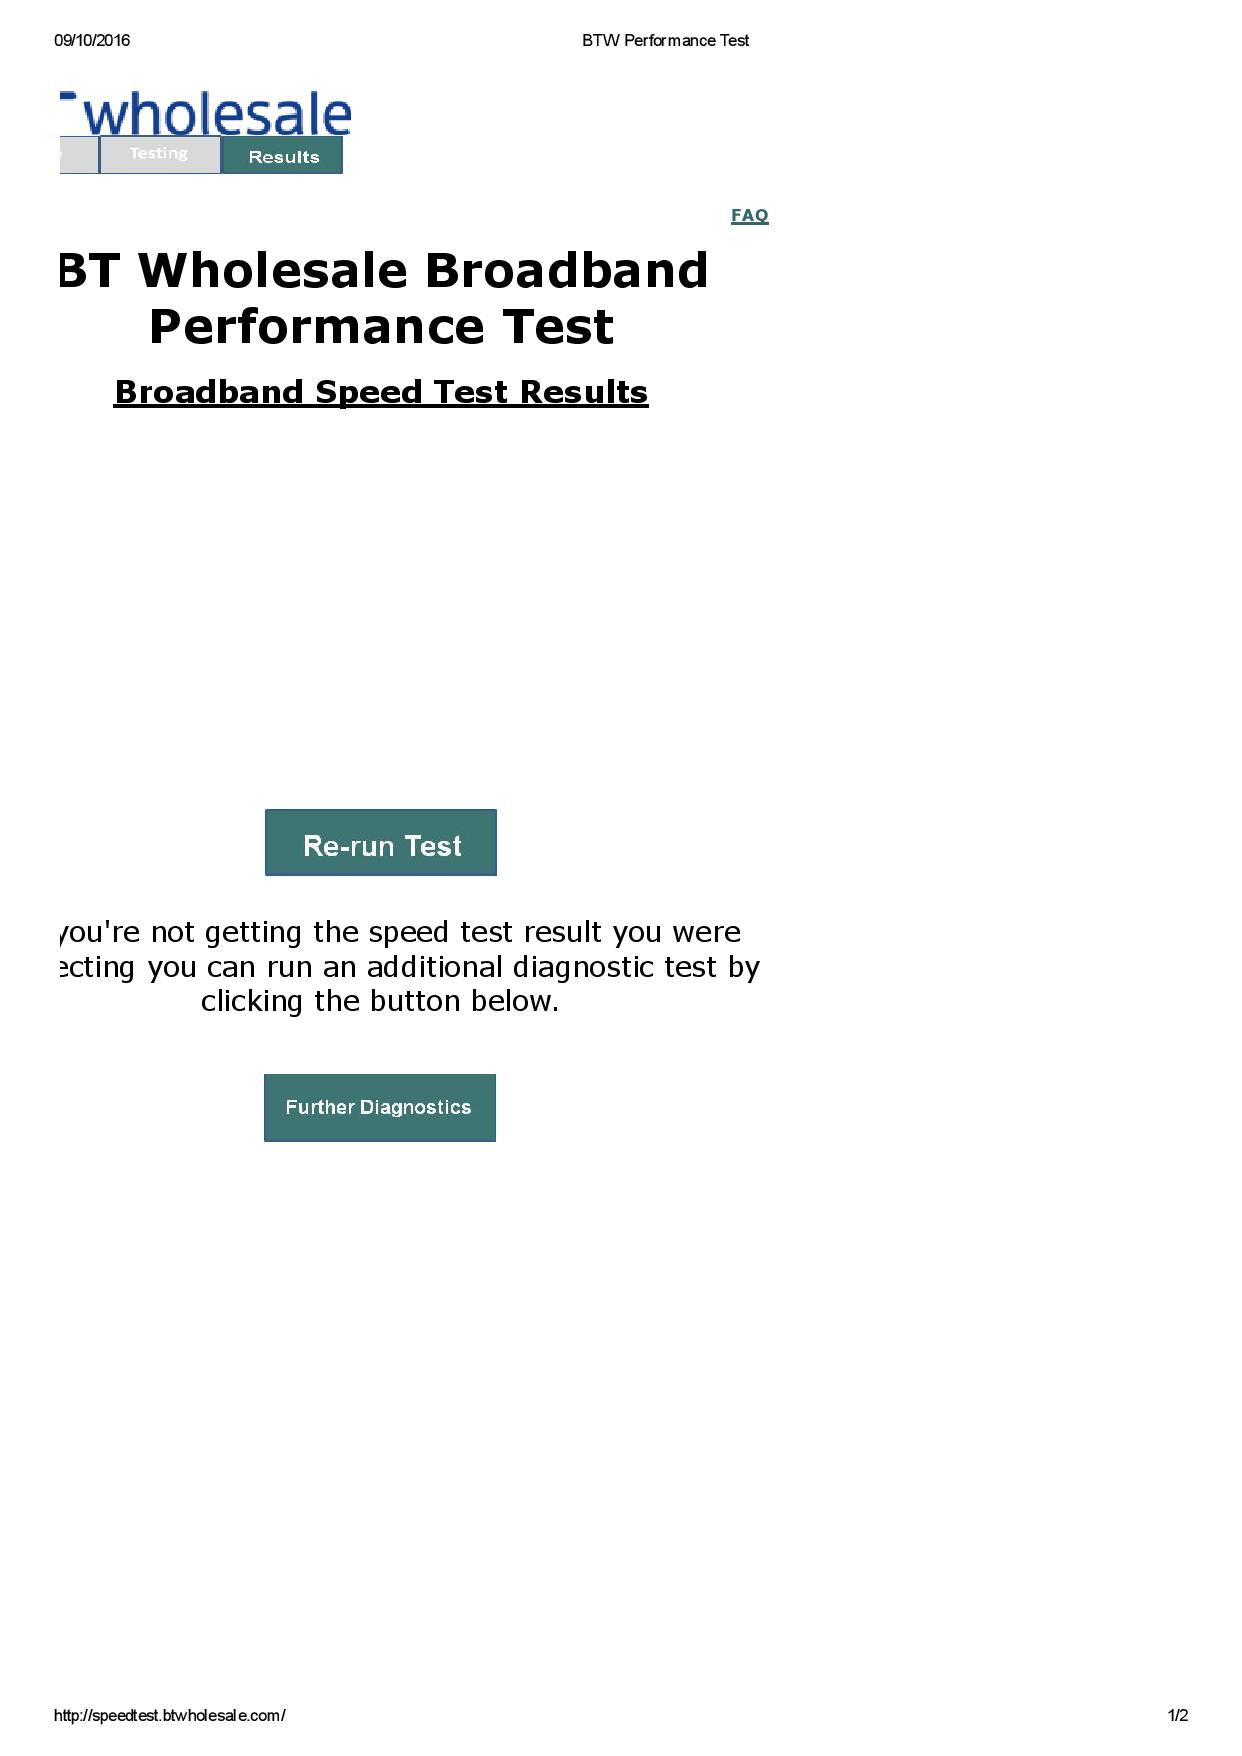 BTW Performance Test-page-001.jpg